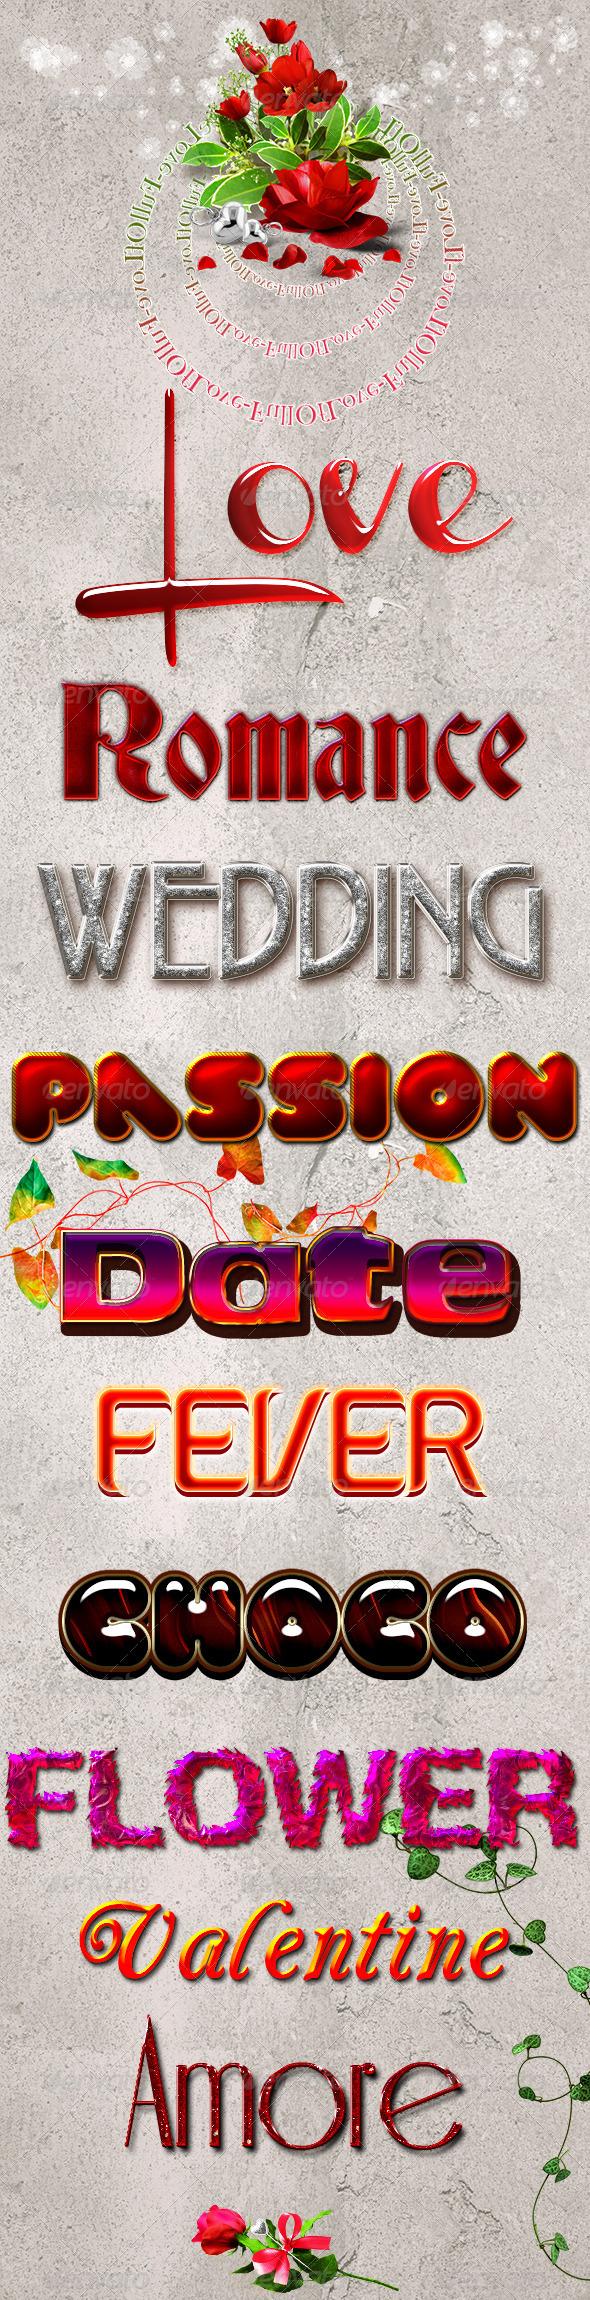 GraphicRiver Valentine Styles 6571506